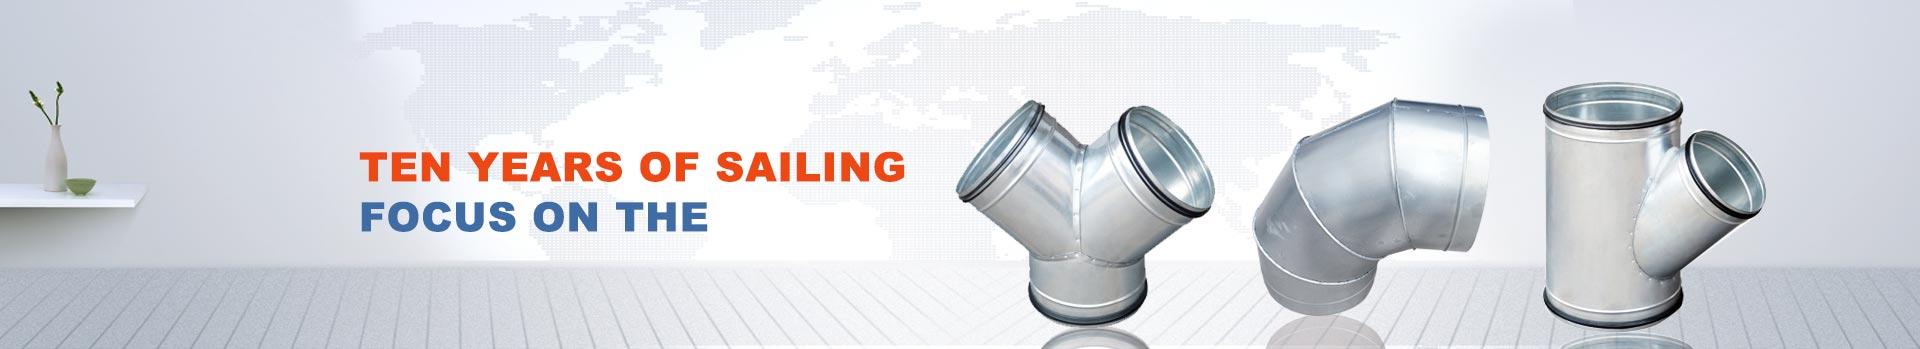 Angle steel flange duct-Zhengzhou Yangfan Ventilation